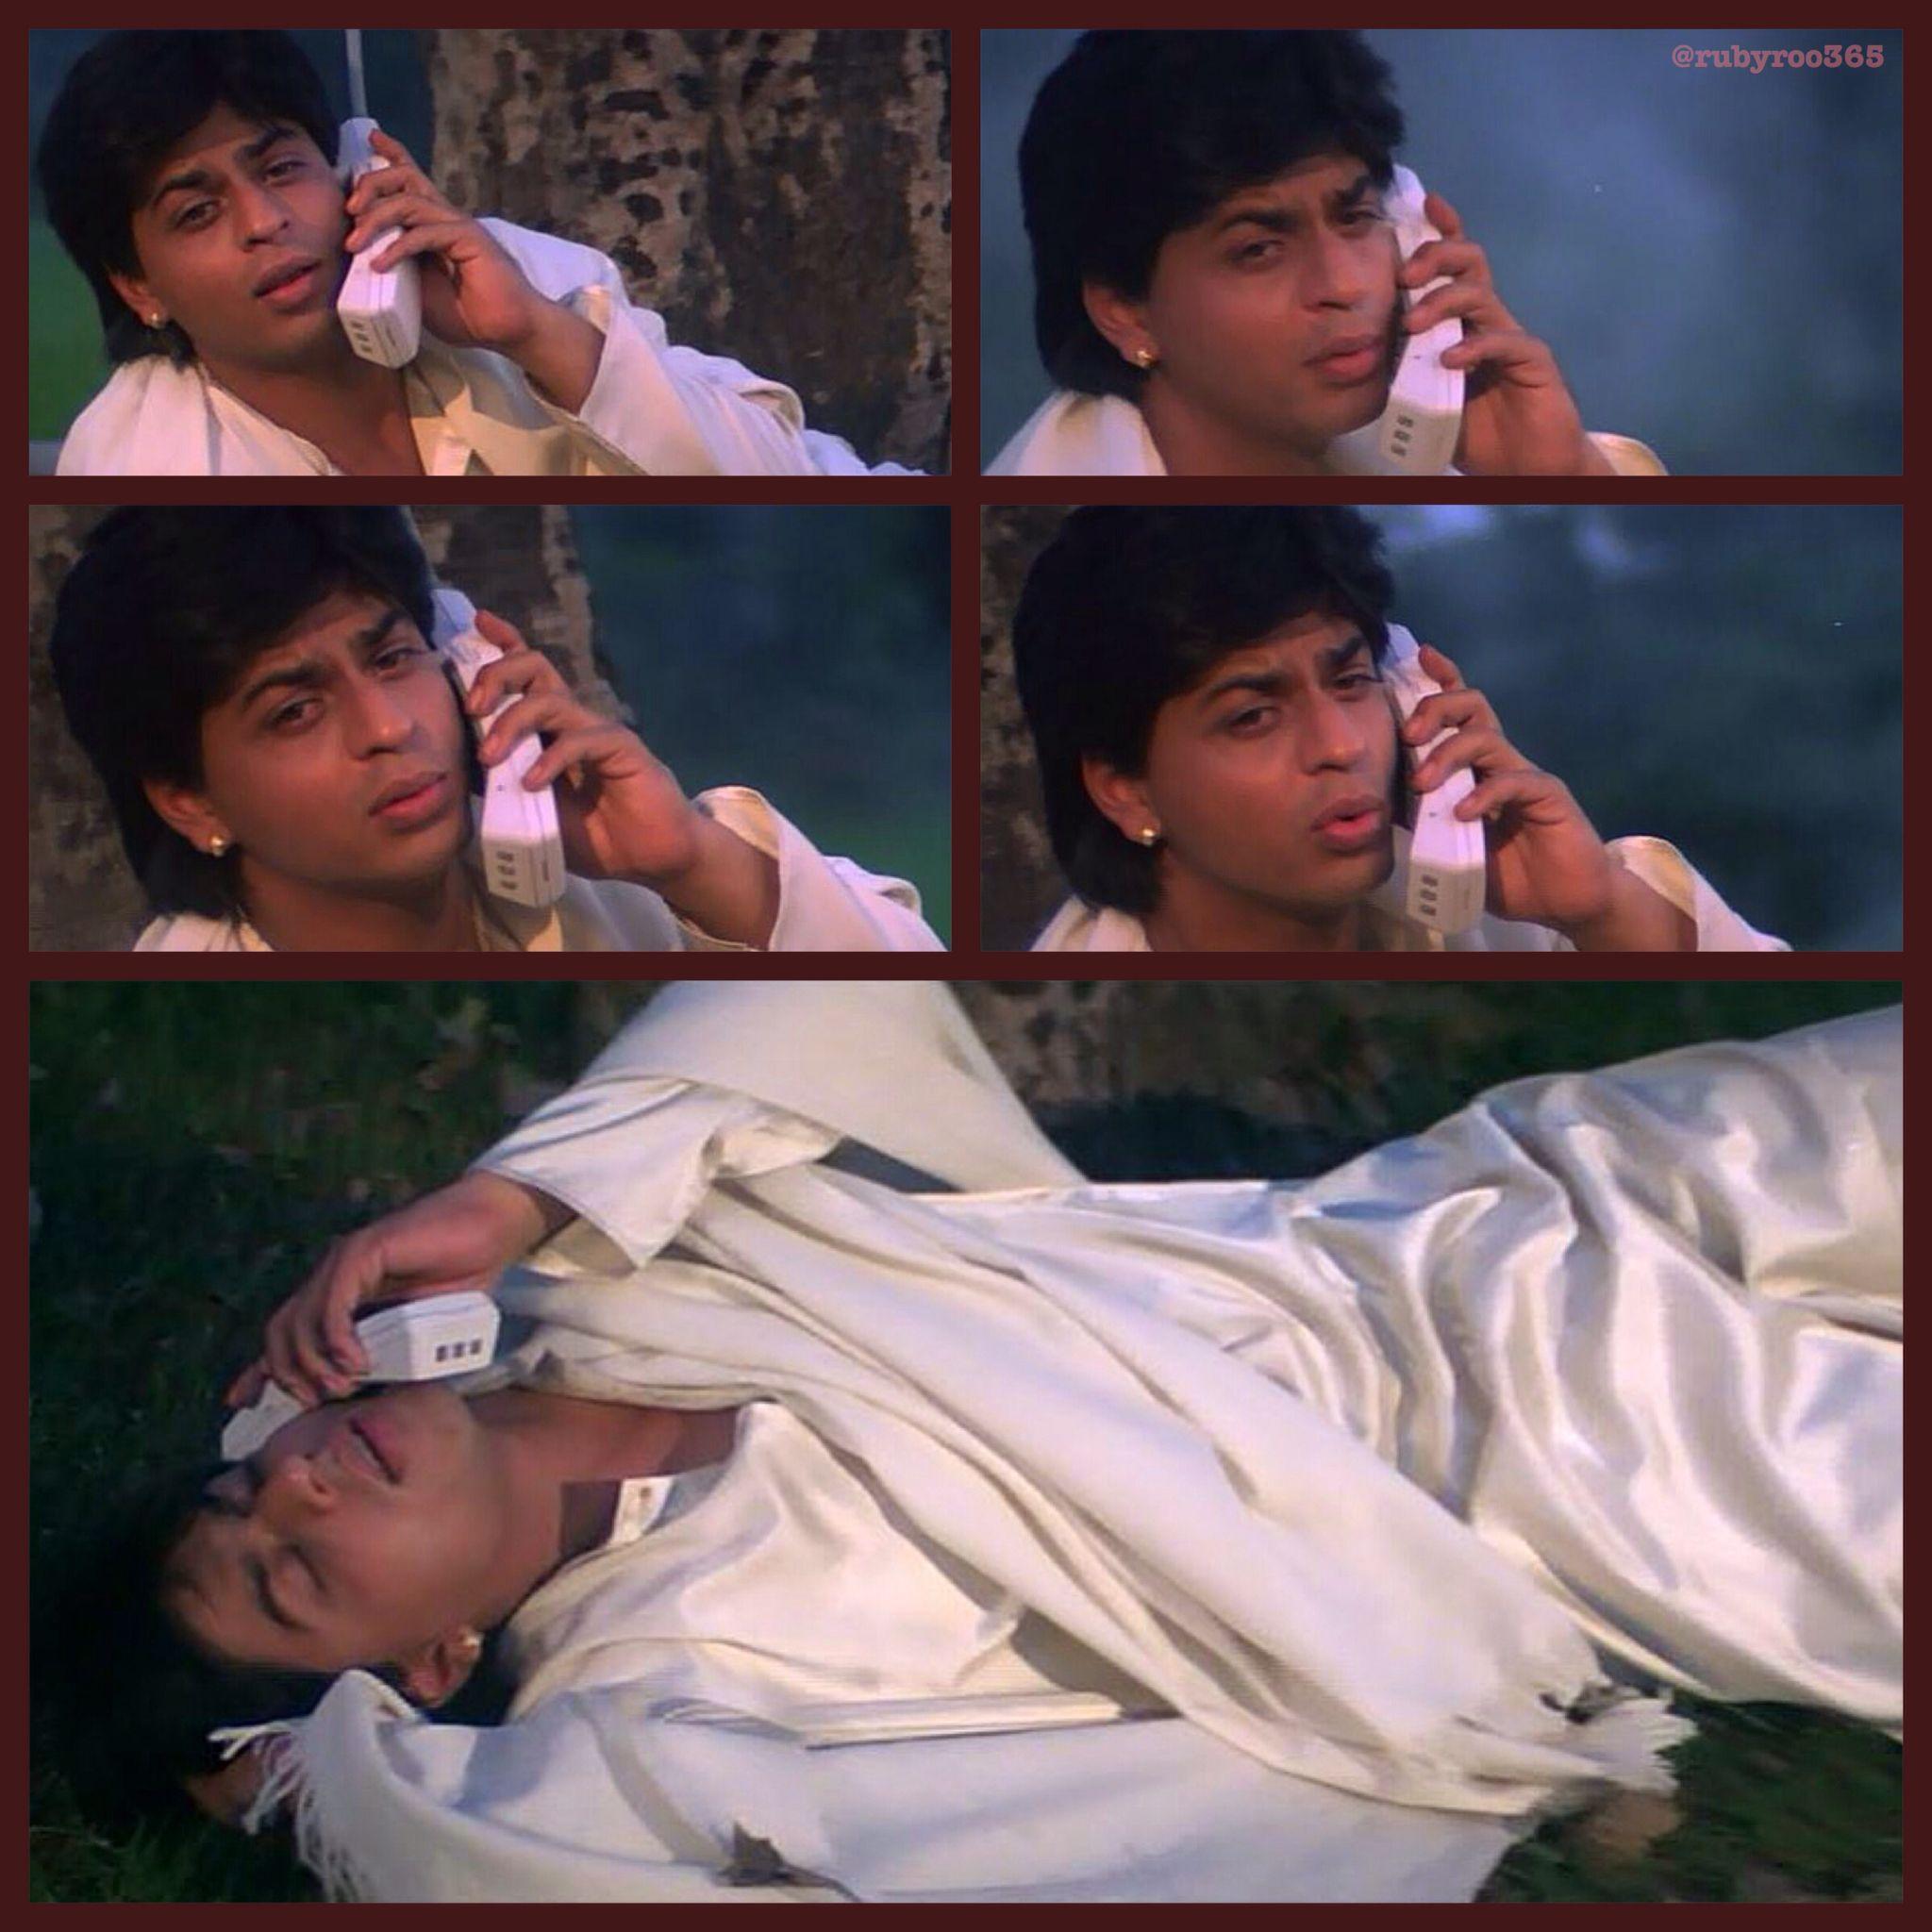 Shah Rukh Khan - Zamaana Deewana (1995) (With images ...